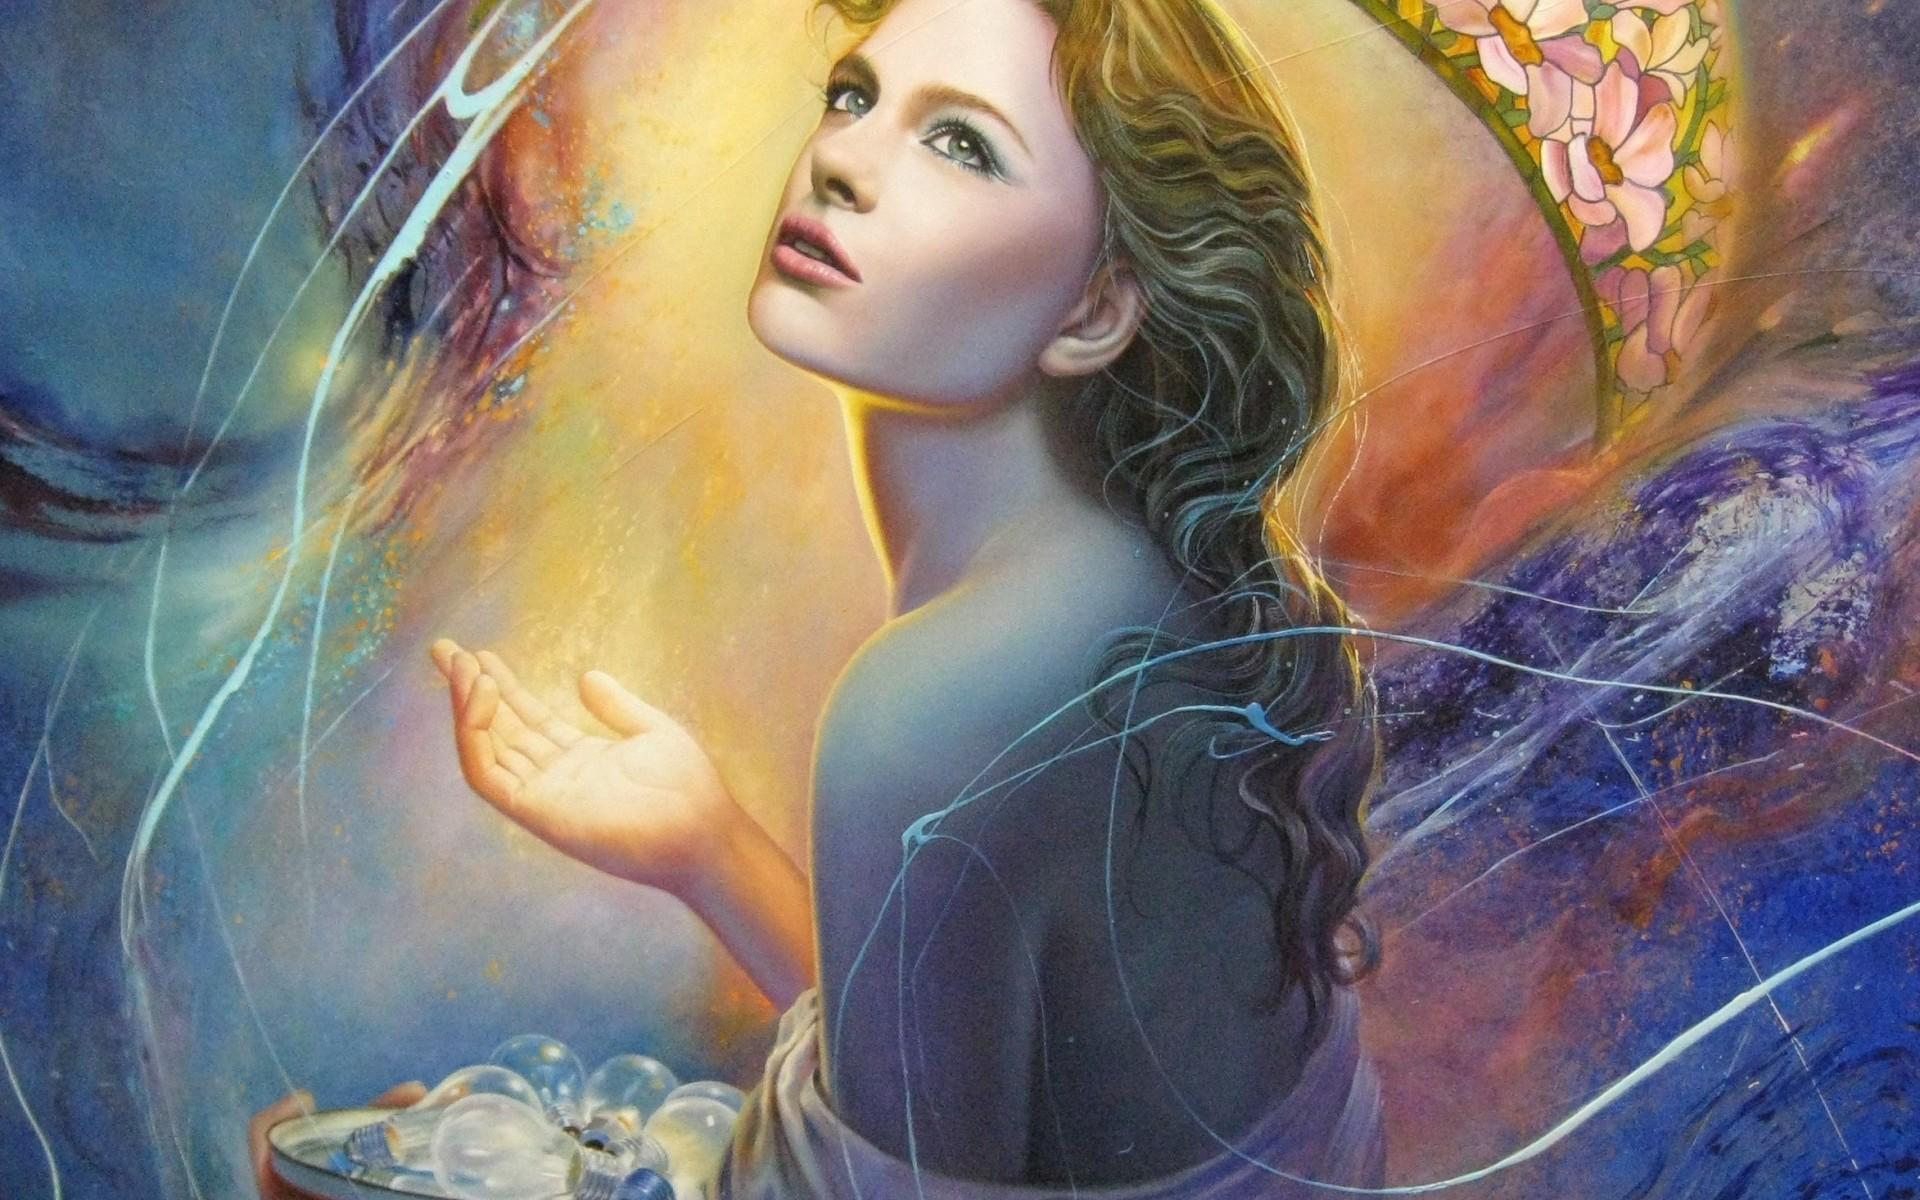 Most Beautiful Painting Woman - HD Wallpaper